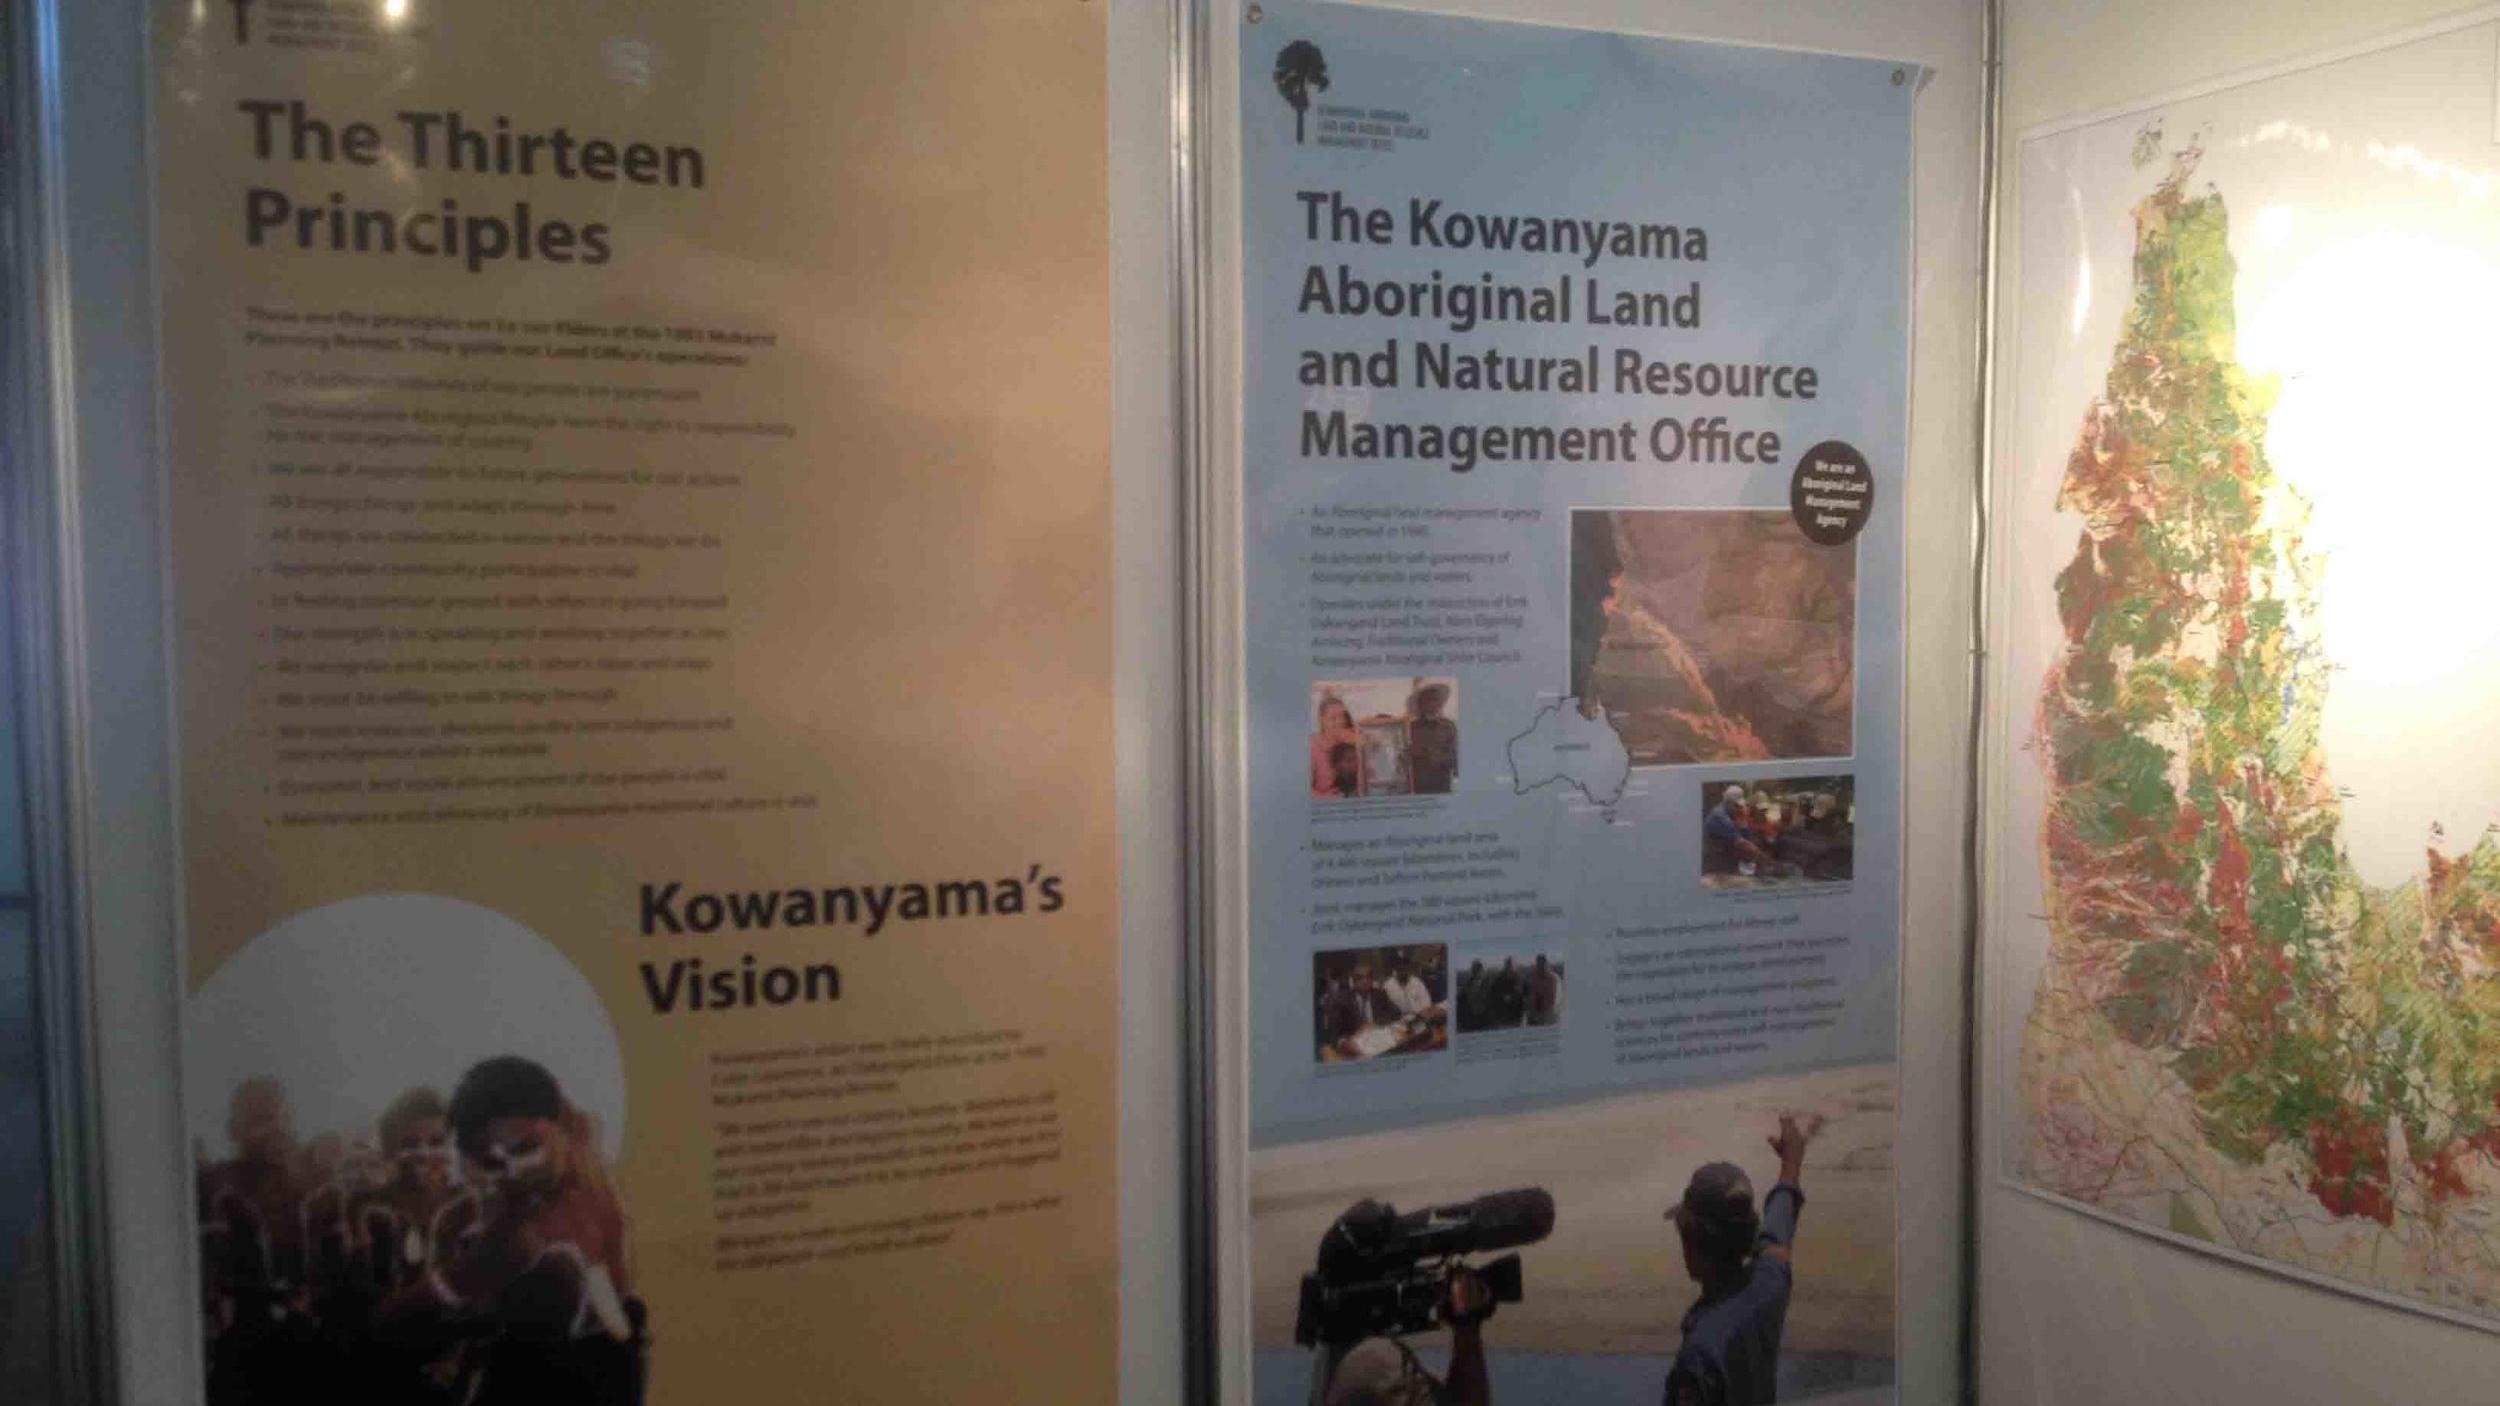 Kowanyama rangers and their swanky posters